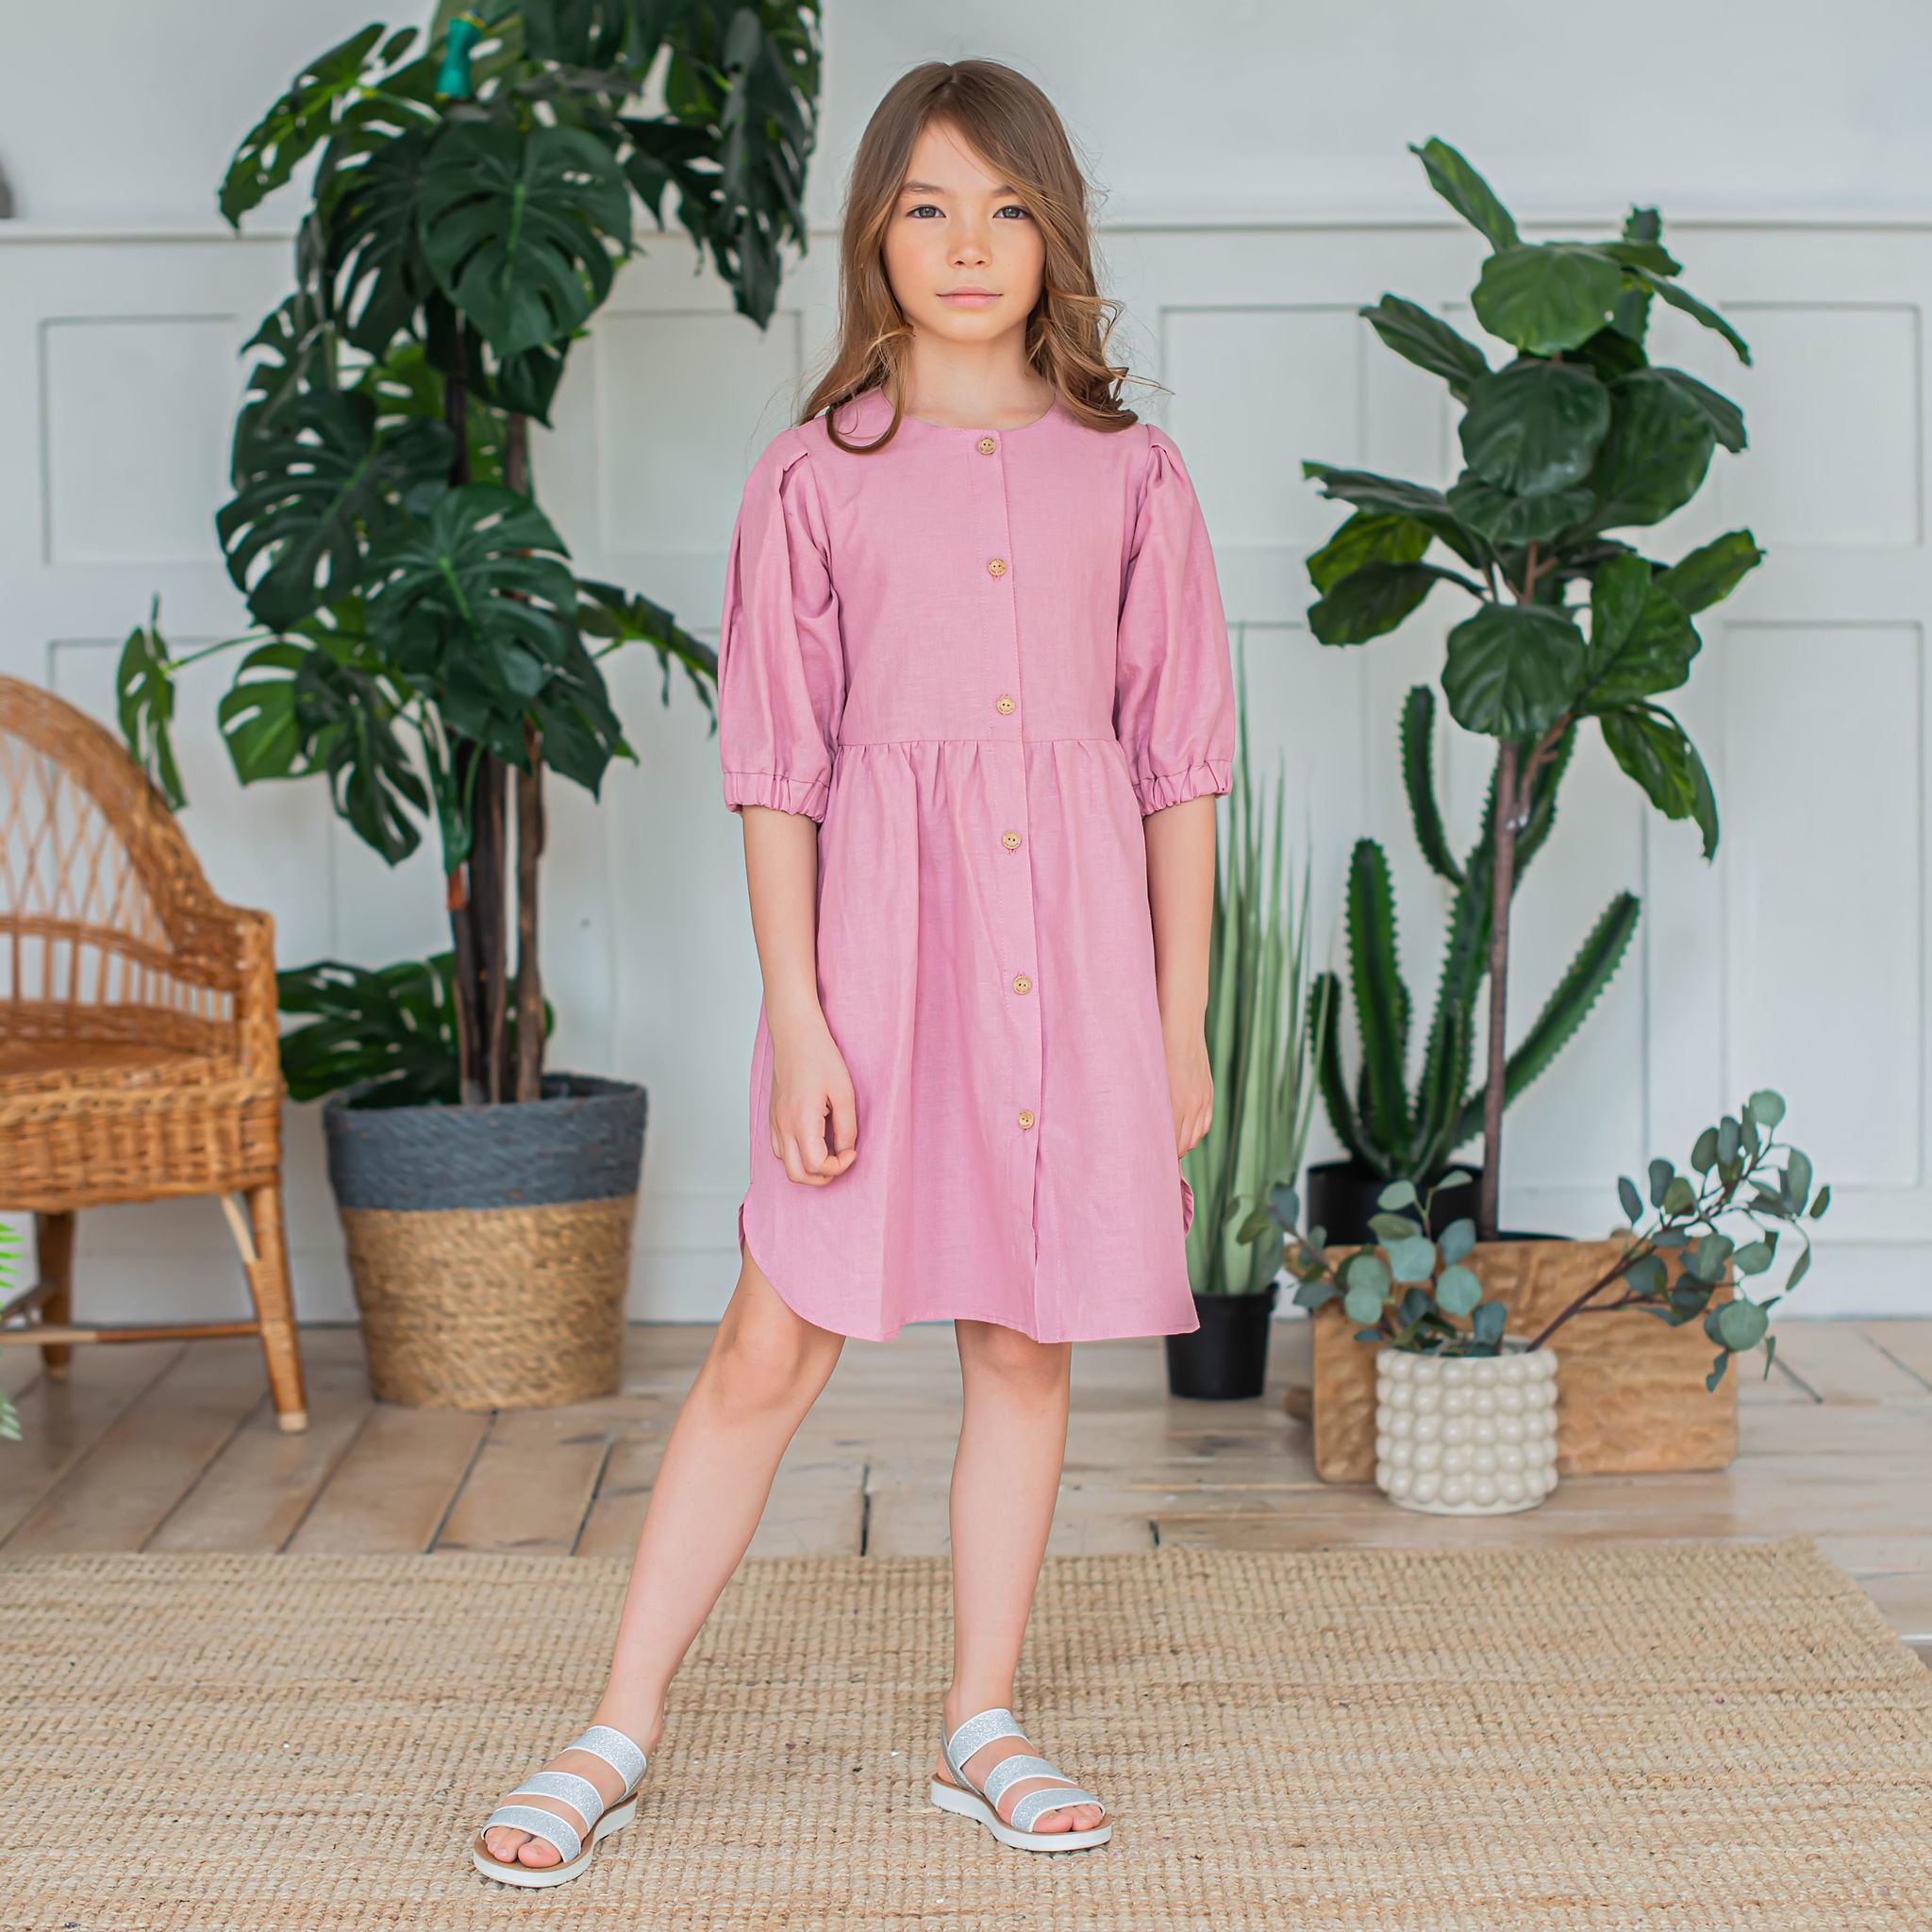 Cotton shirt dress for teens - Peony